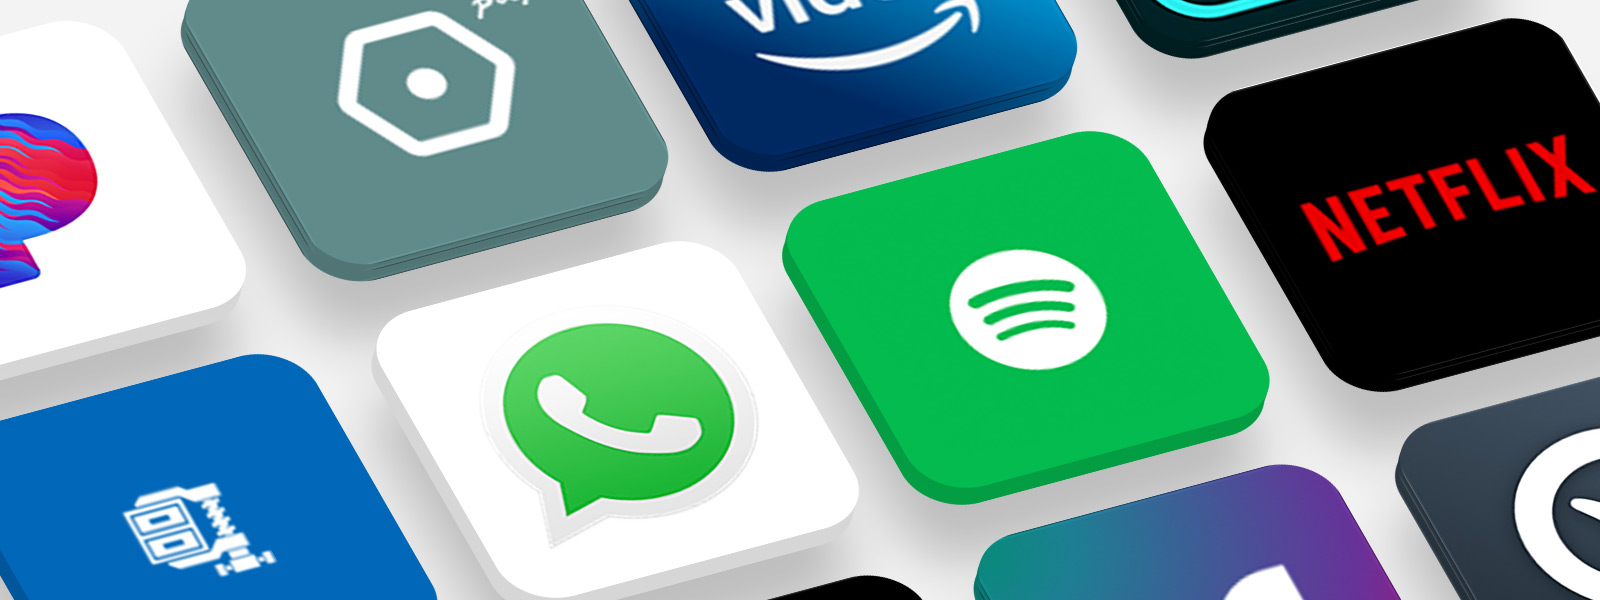 Nombreux logos d'applications populaires